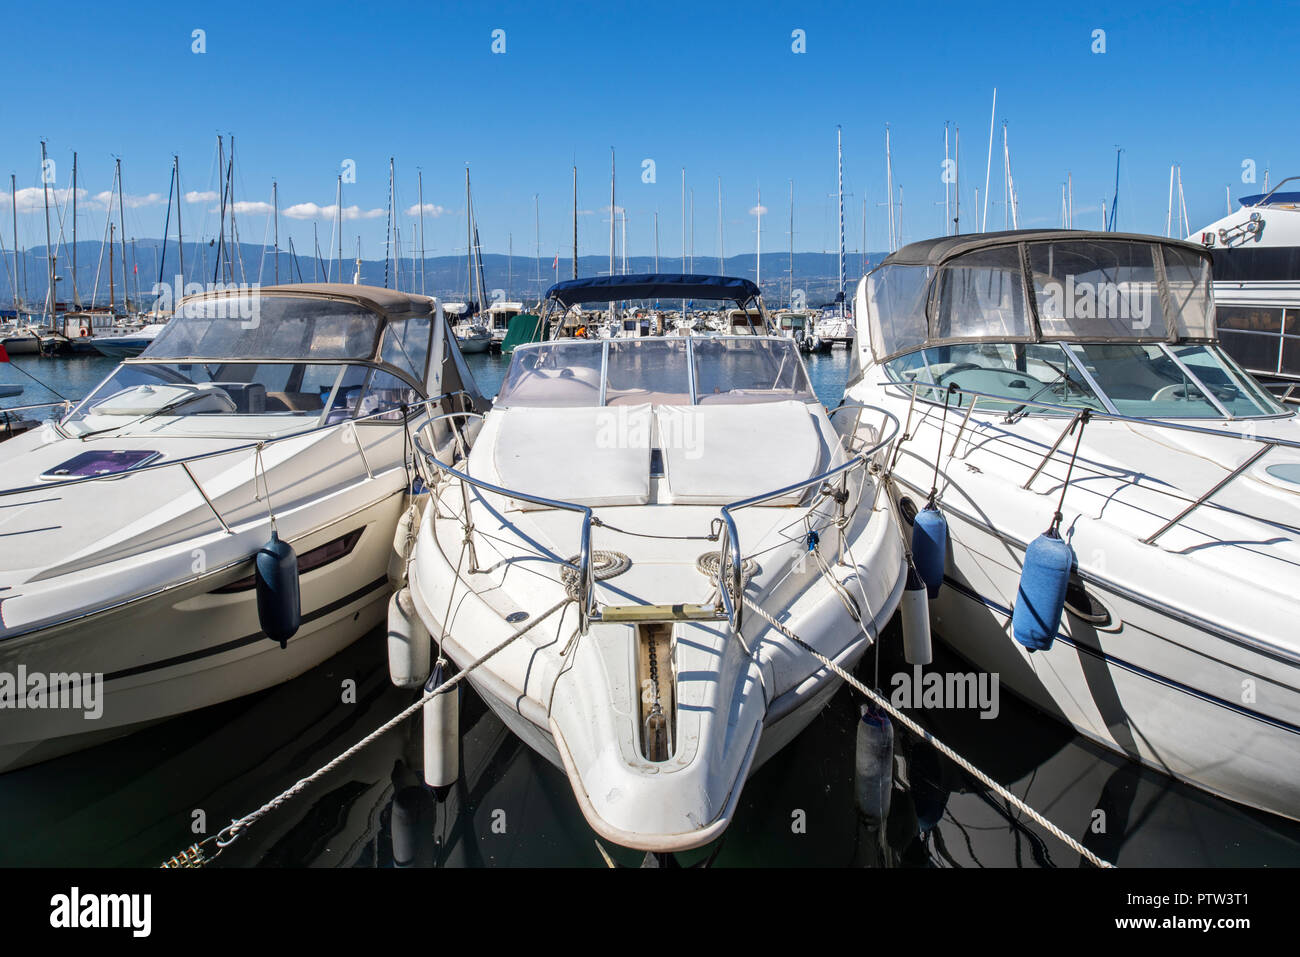 Motorboats, sailing boats and yachts moored in the marina at Yvoire along Lake Geneva / lac Léman, Haute-Savoie, France - Stock Image